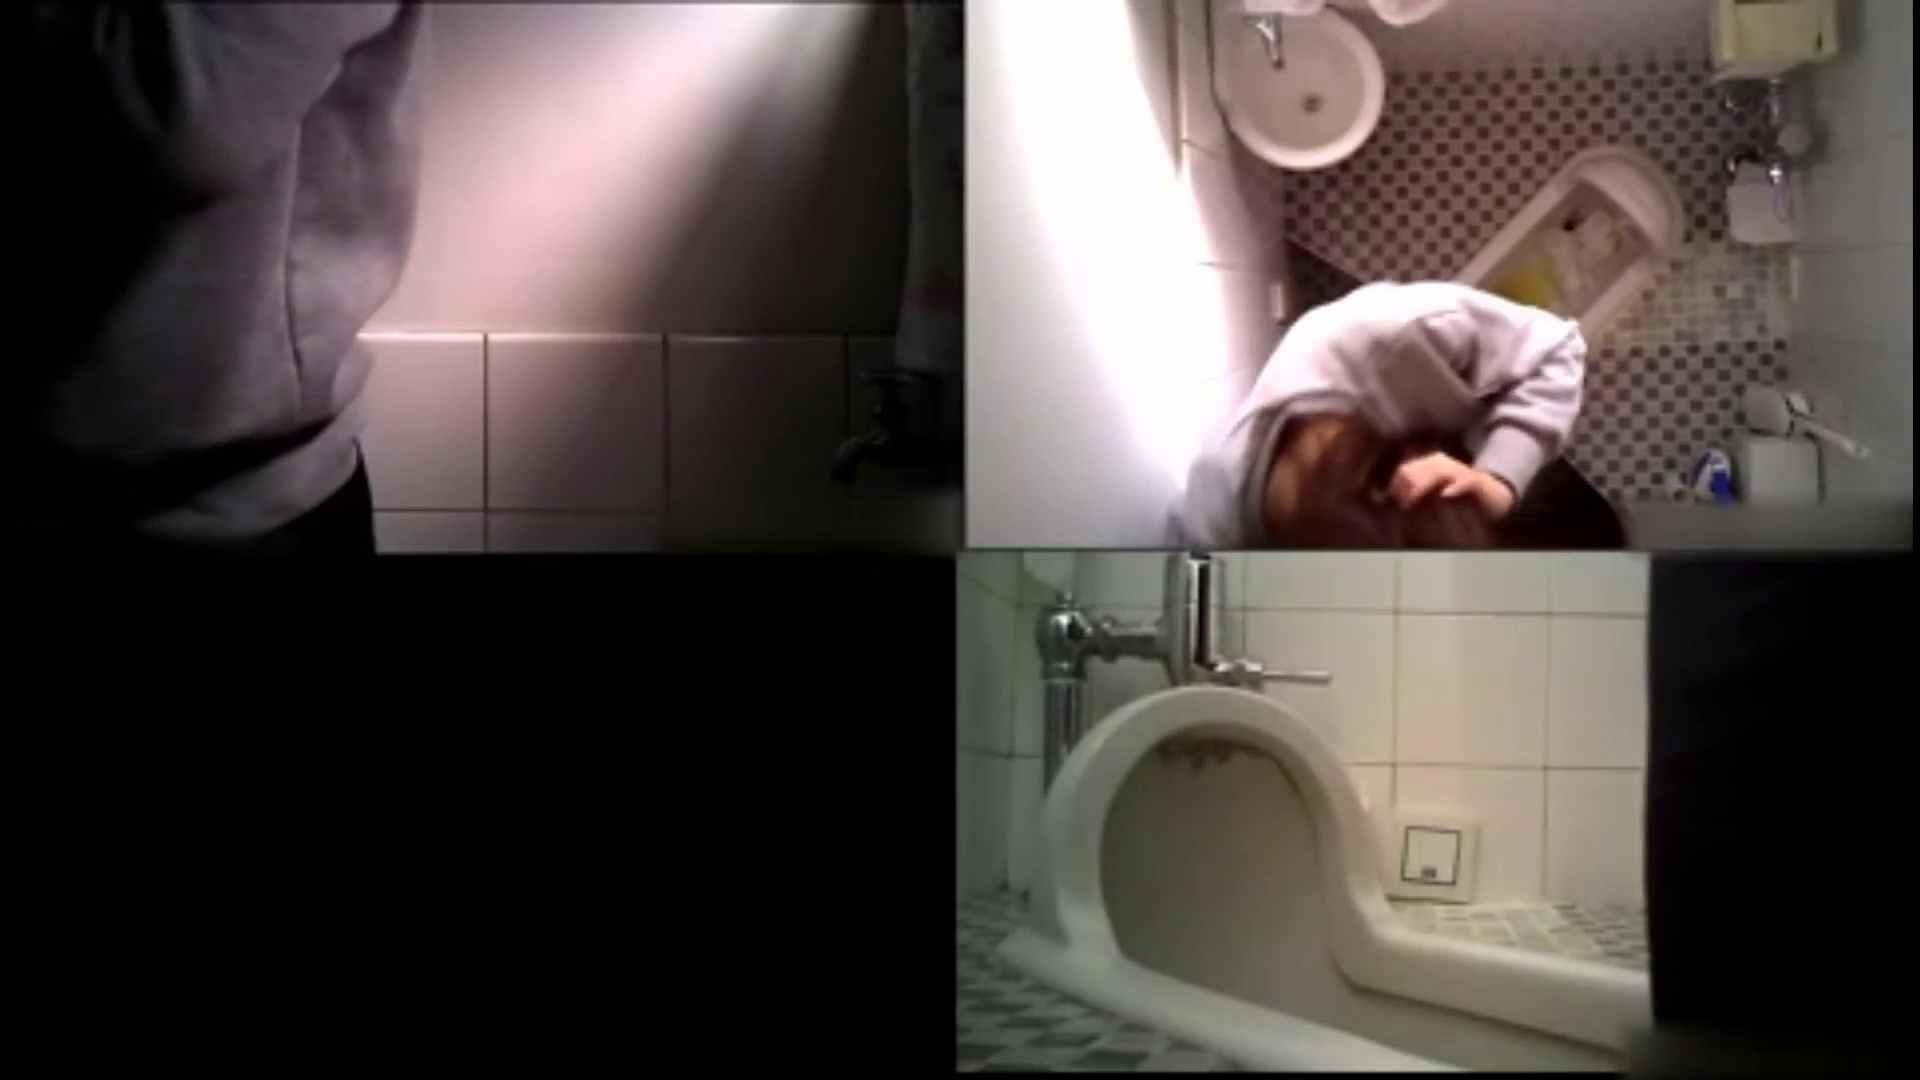 Vol.05 花の女子大生 トイレ恥態 進化系マルチアングル!! マルチアングル スケベ動画紹介 101枚 63